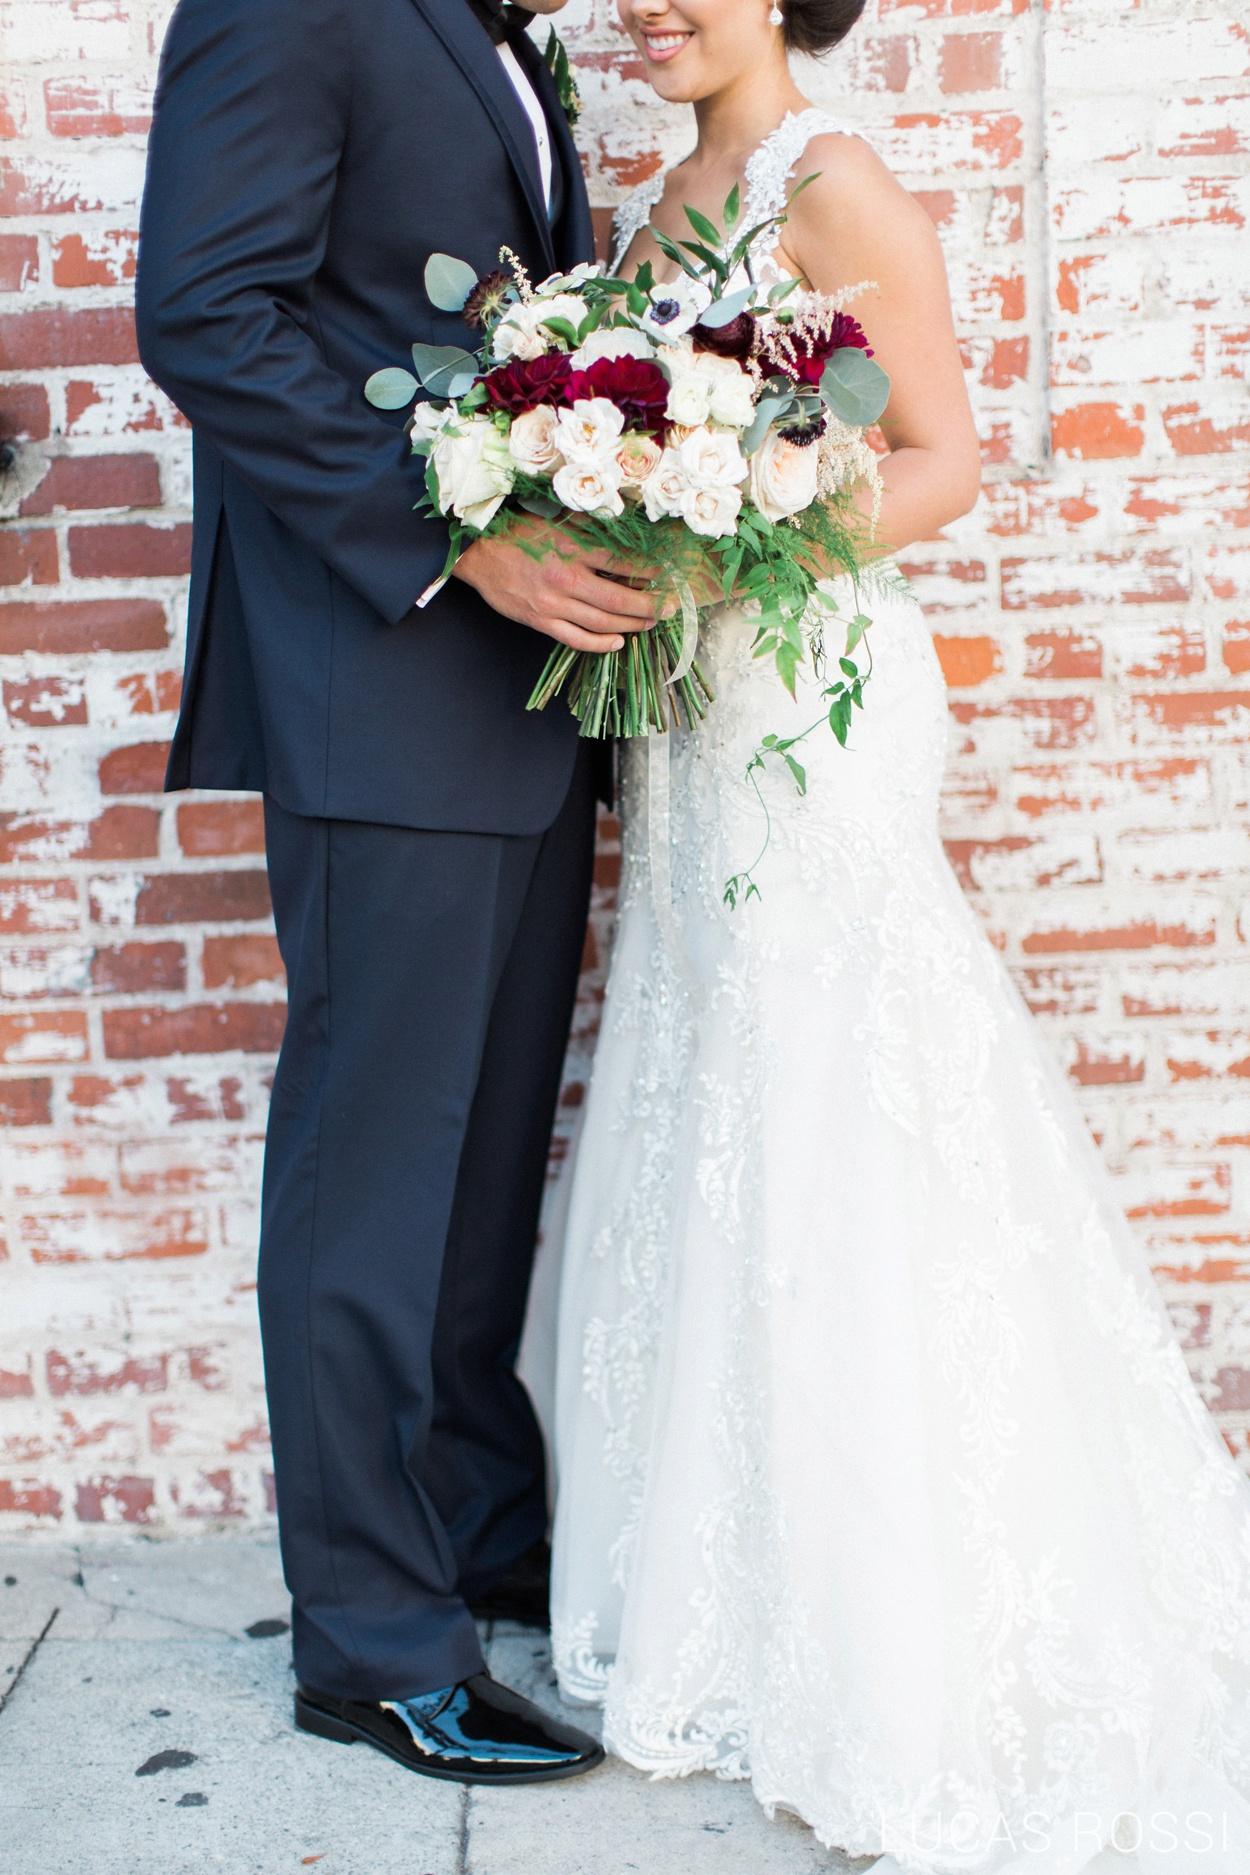 Carondelet-House-Wedding-Caitlin-Parker-366